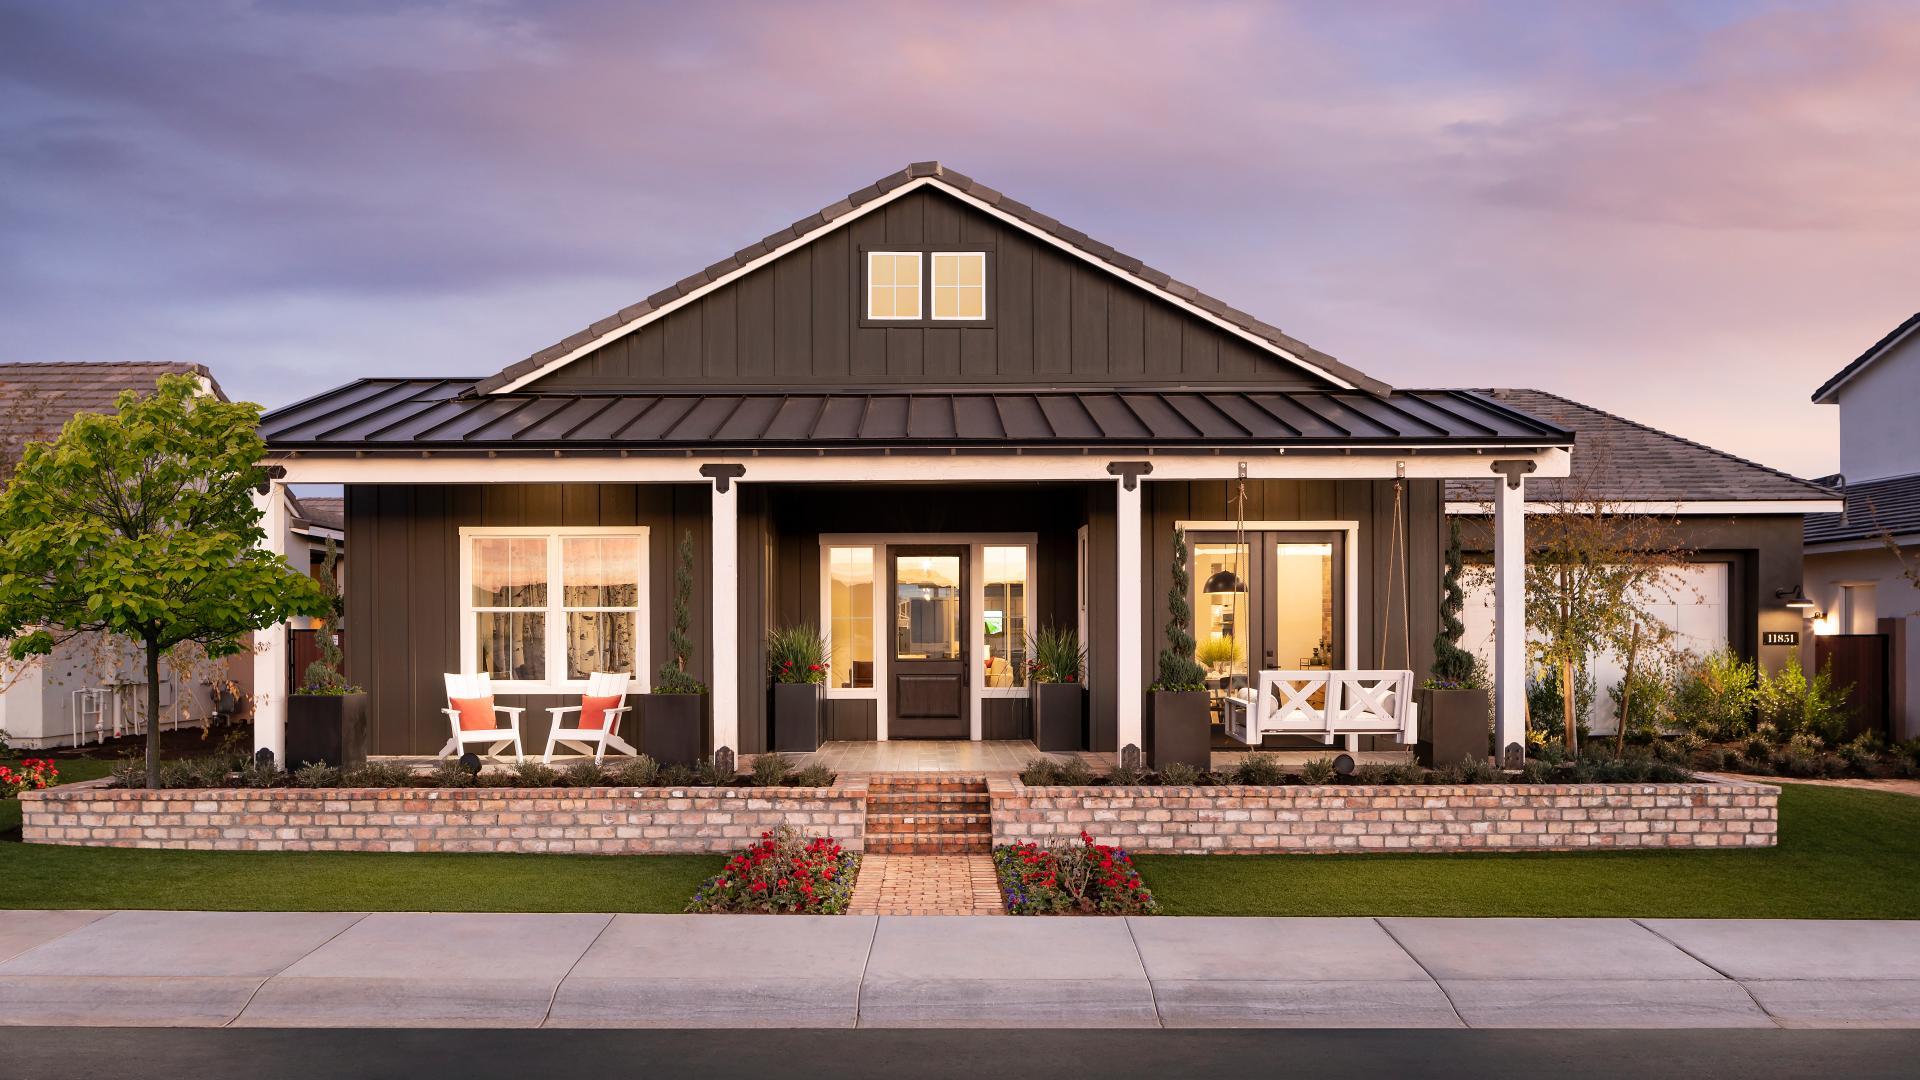 Distinct farmhouse, craftsman, prairie, and Spanish architecture